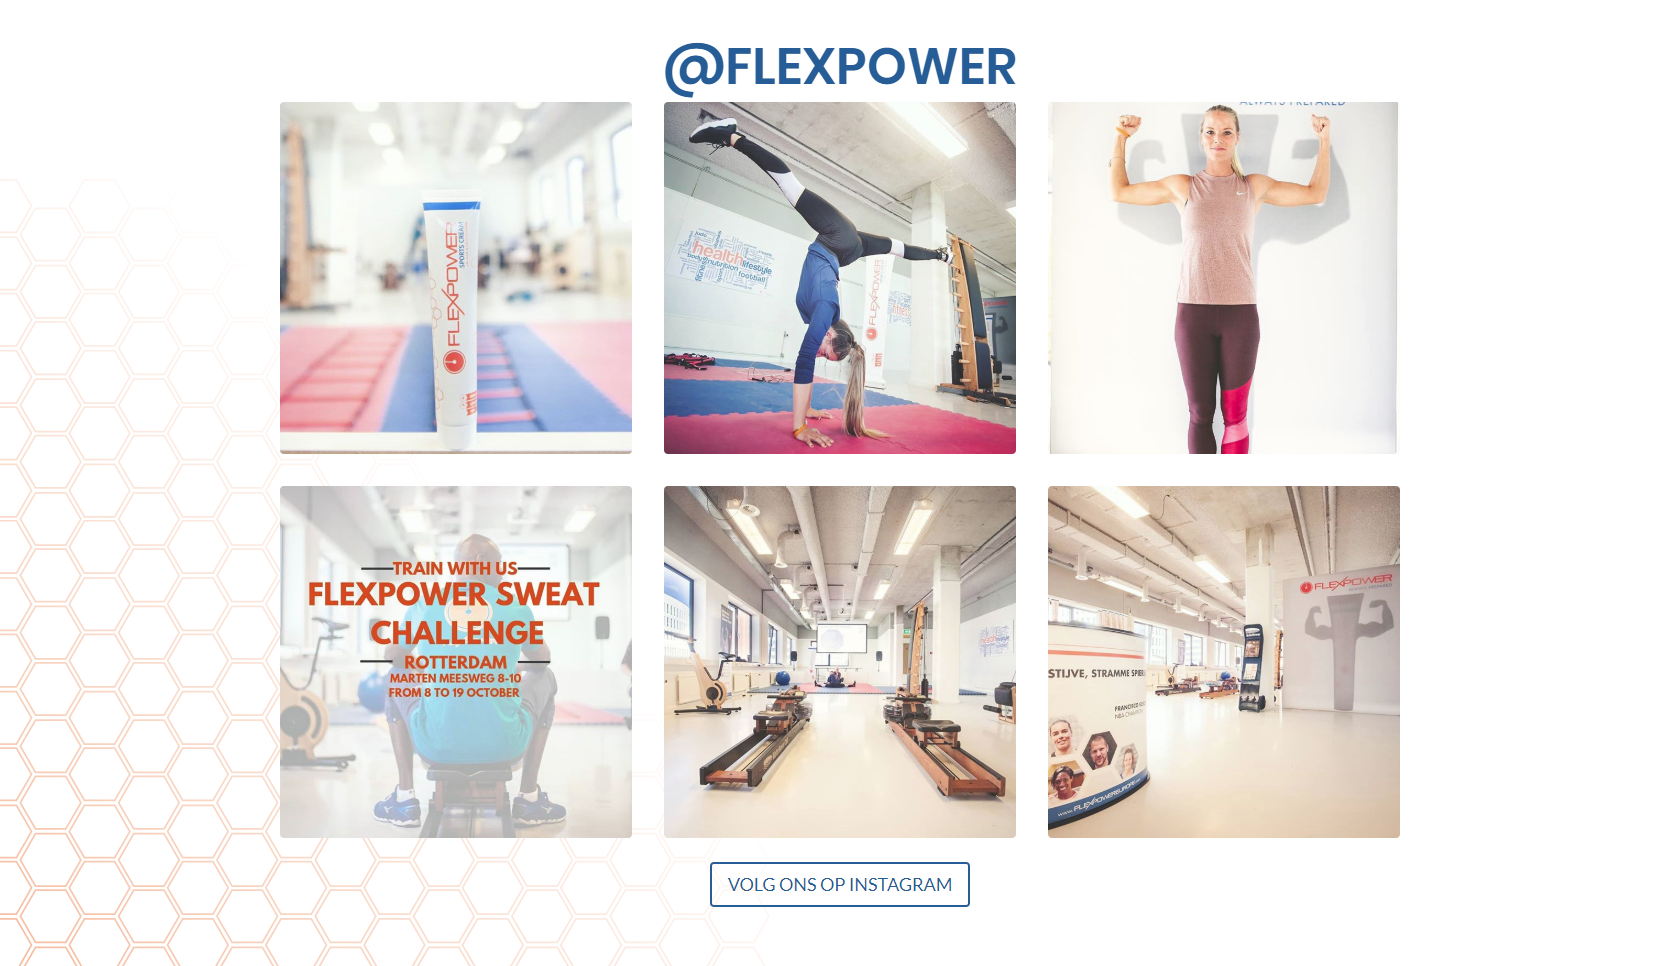 flexpower